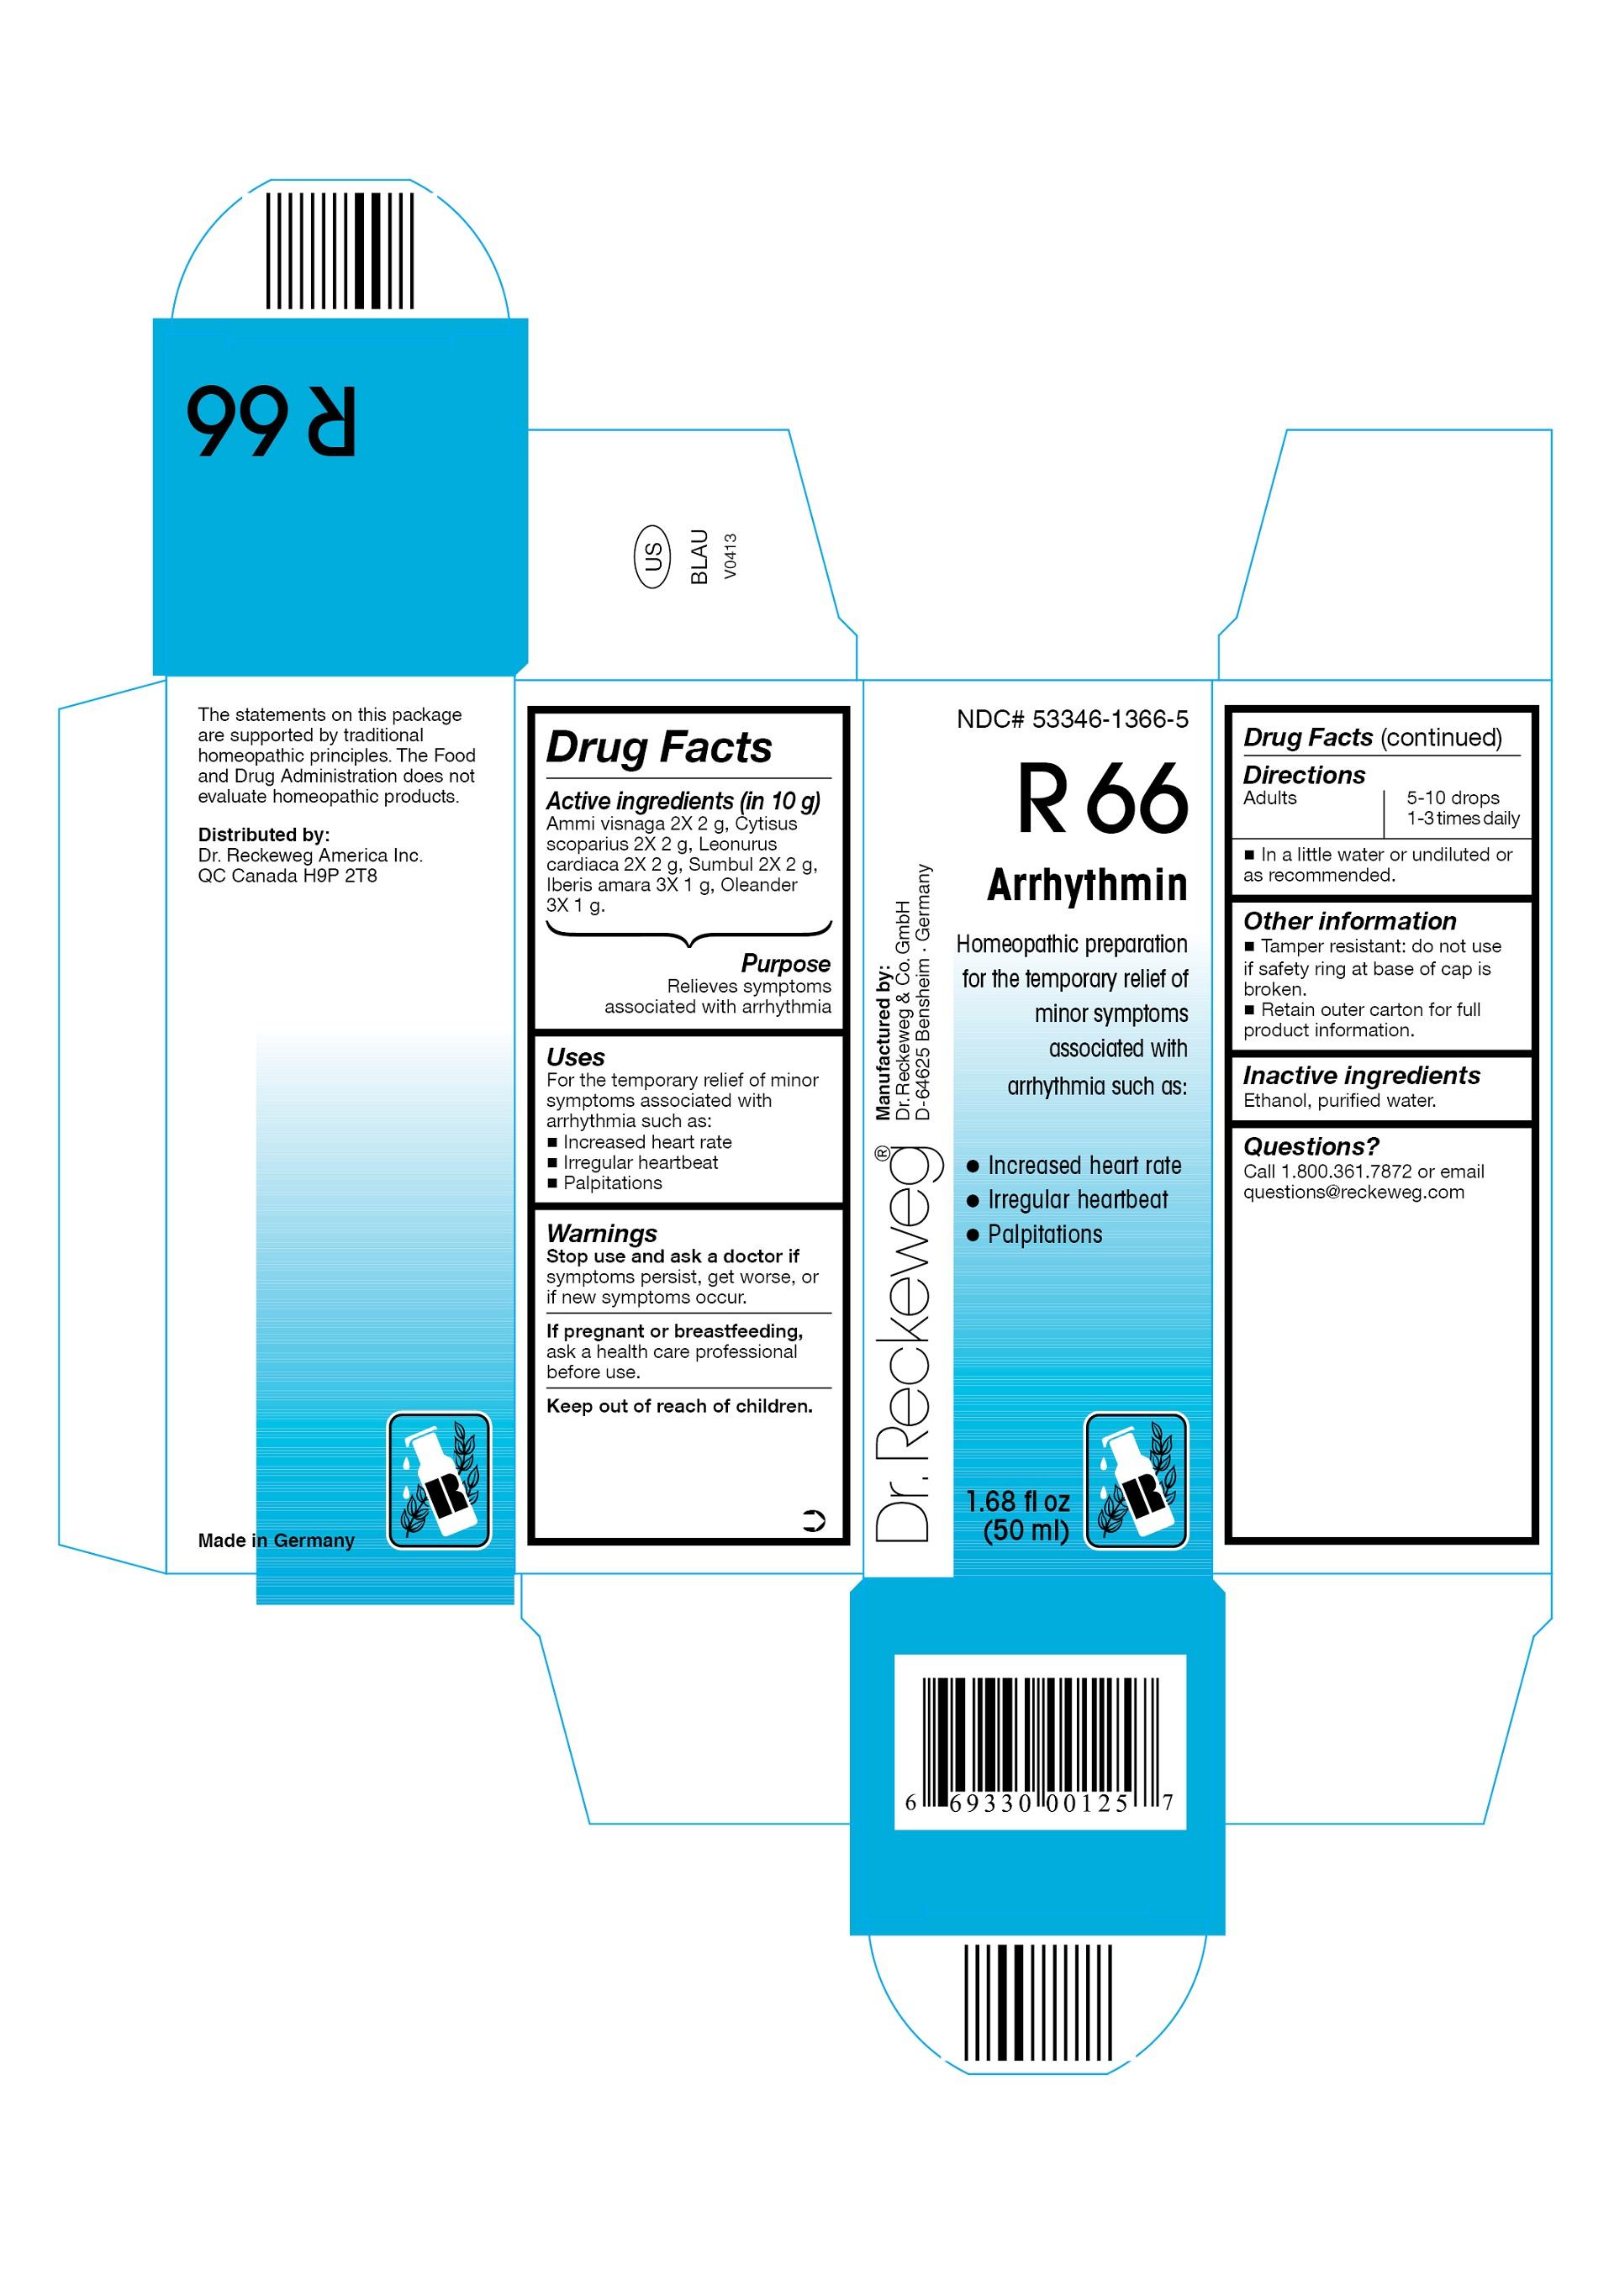 Dr. Reckeweg R66 Arrhythmin Combination Product (Ammi Visnaga 2x, Cytisus Scoparius 2x, Leonurus Cardiaca 2x, Sumbul 2x, Iberis Amara 3x, Oleander 3x) Liquid [Pharmazeutische Fabrik Dr. Reckeweg & Co]